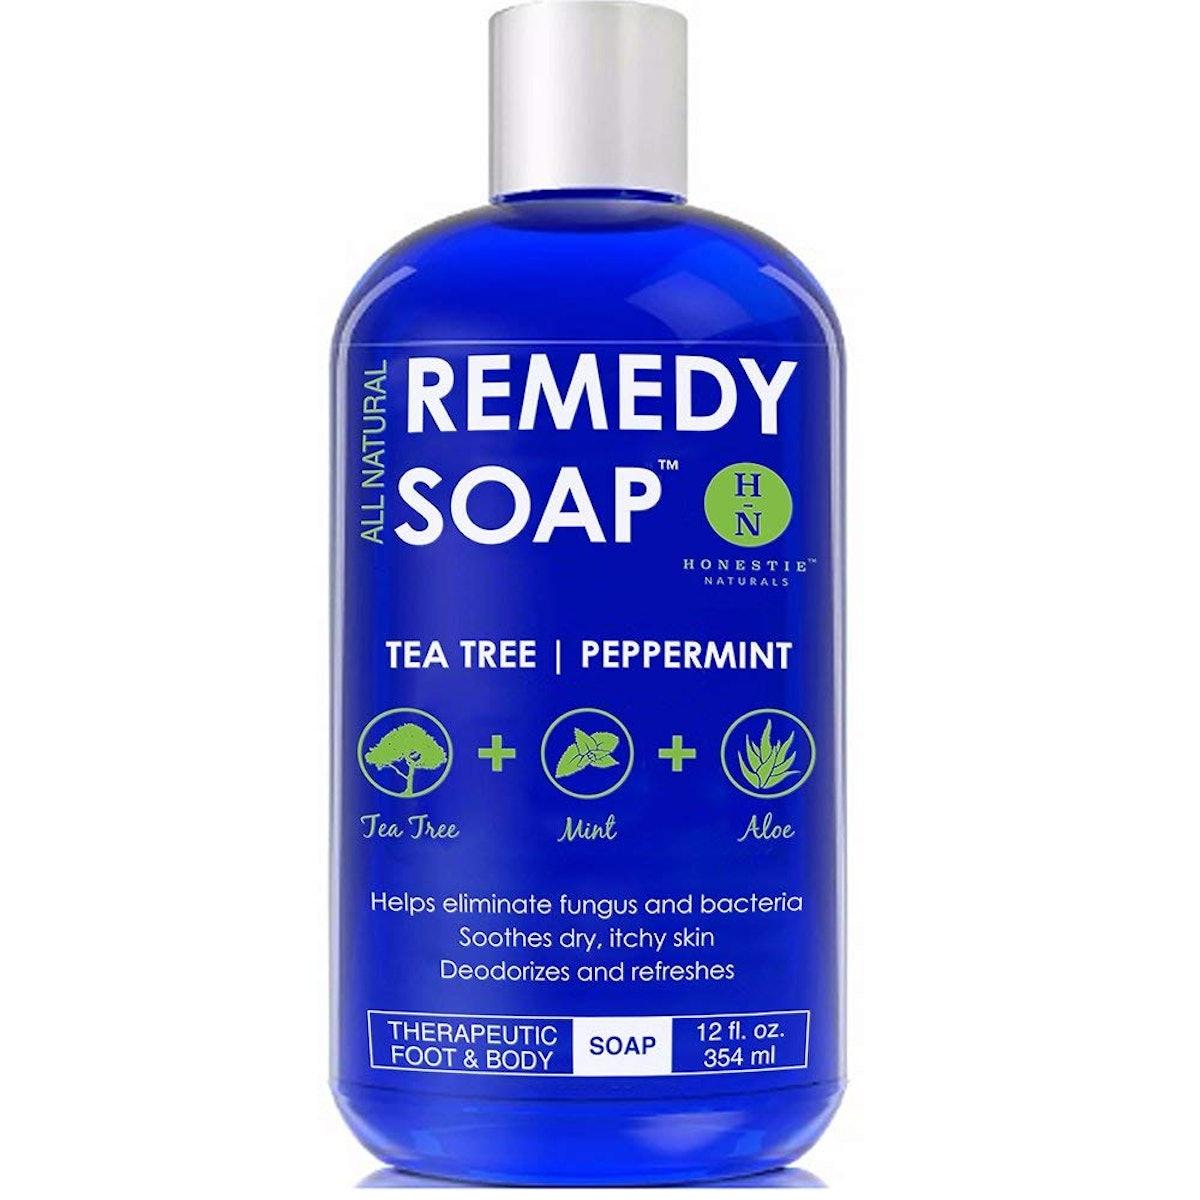 Remedy Wash Anti-fungal Soap